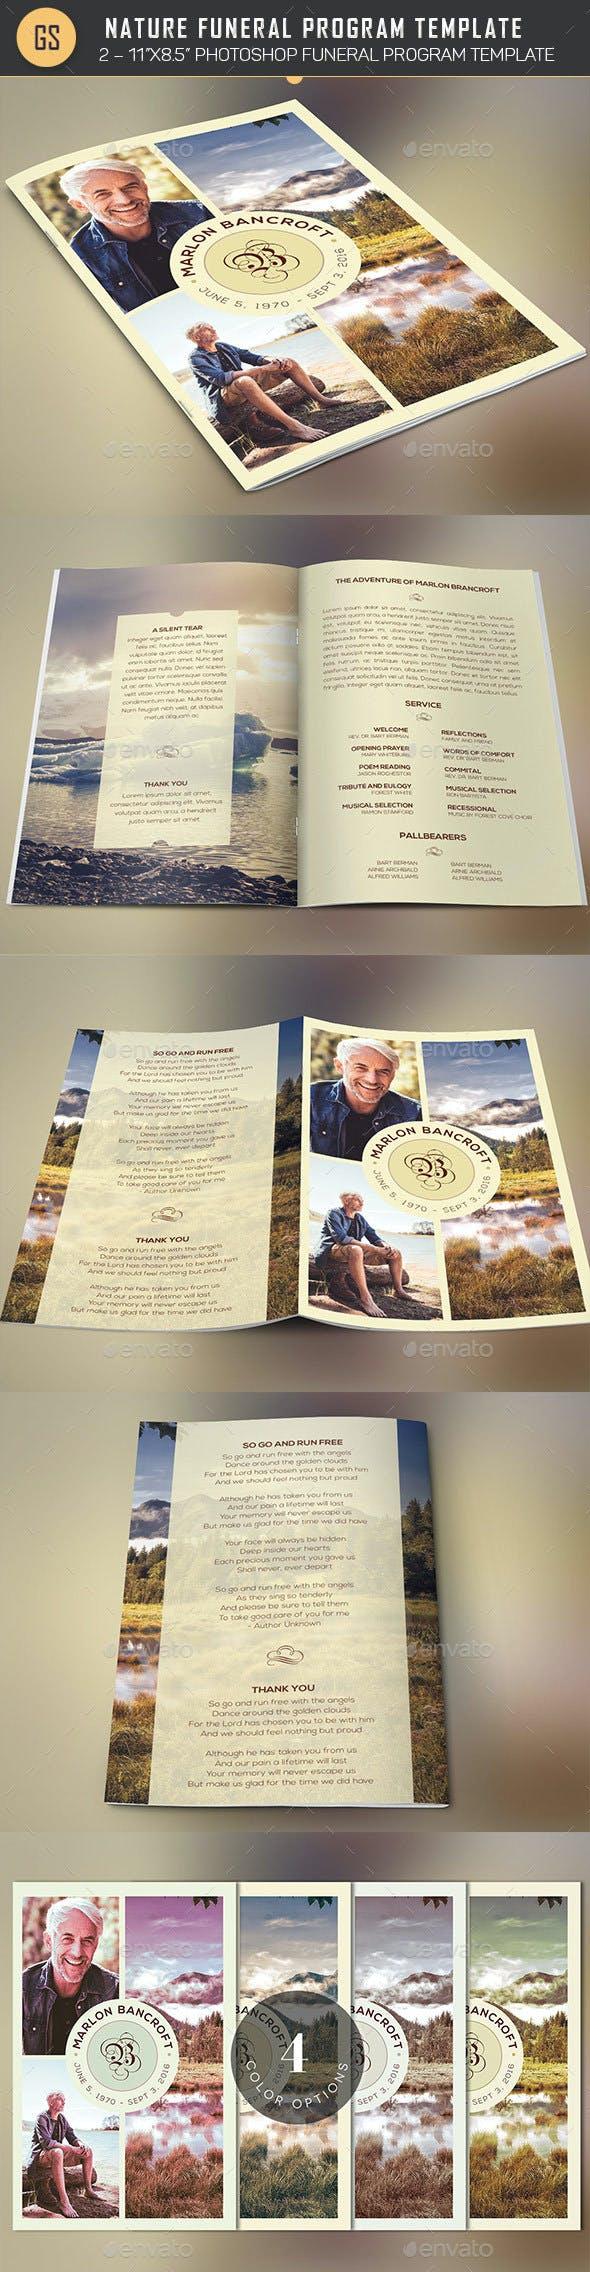 nature funeral program photoshop template v1 by godserv2 graphicriver